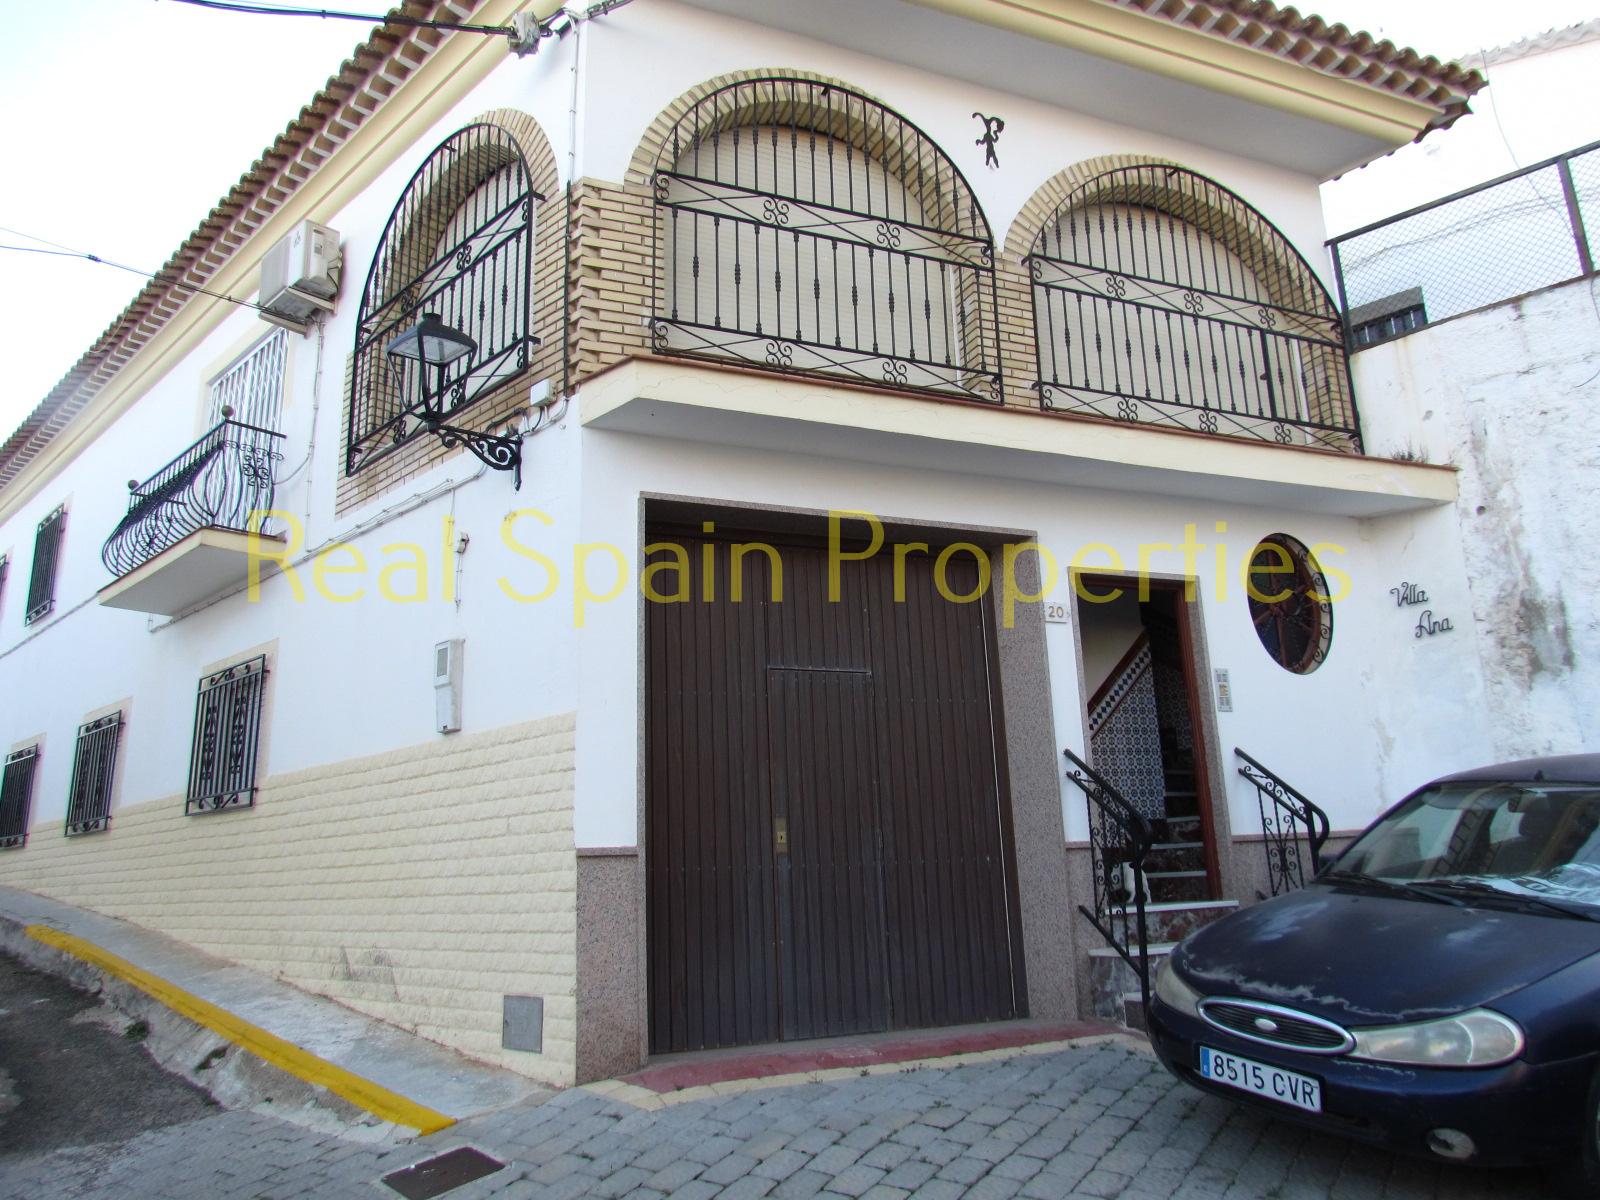 Casa Infanta